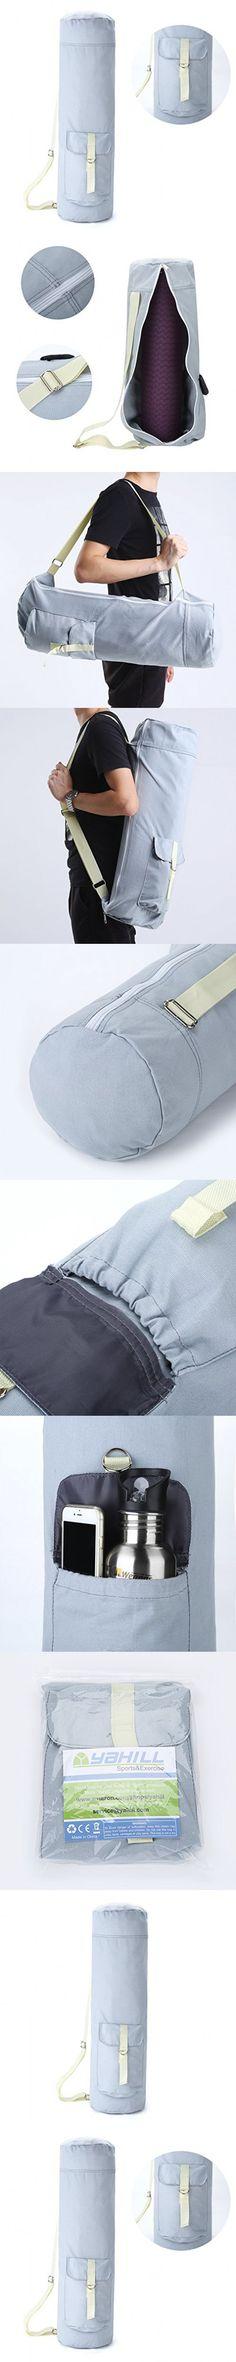 Yahill® 28'' Large Cotton Full-Zip Pocket Yoga Mat Bag, High Density Cotton Canvas Yoga Bag ,Gray